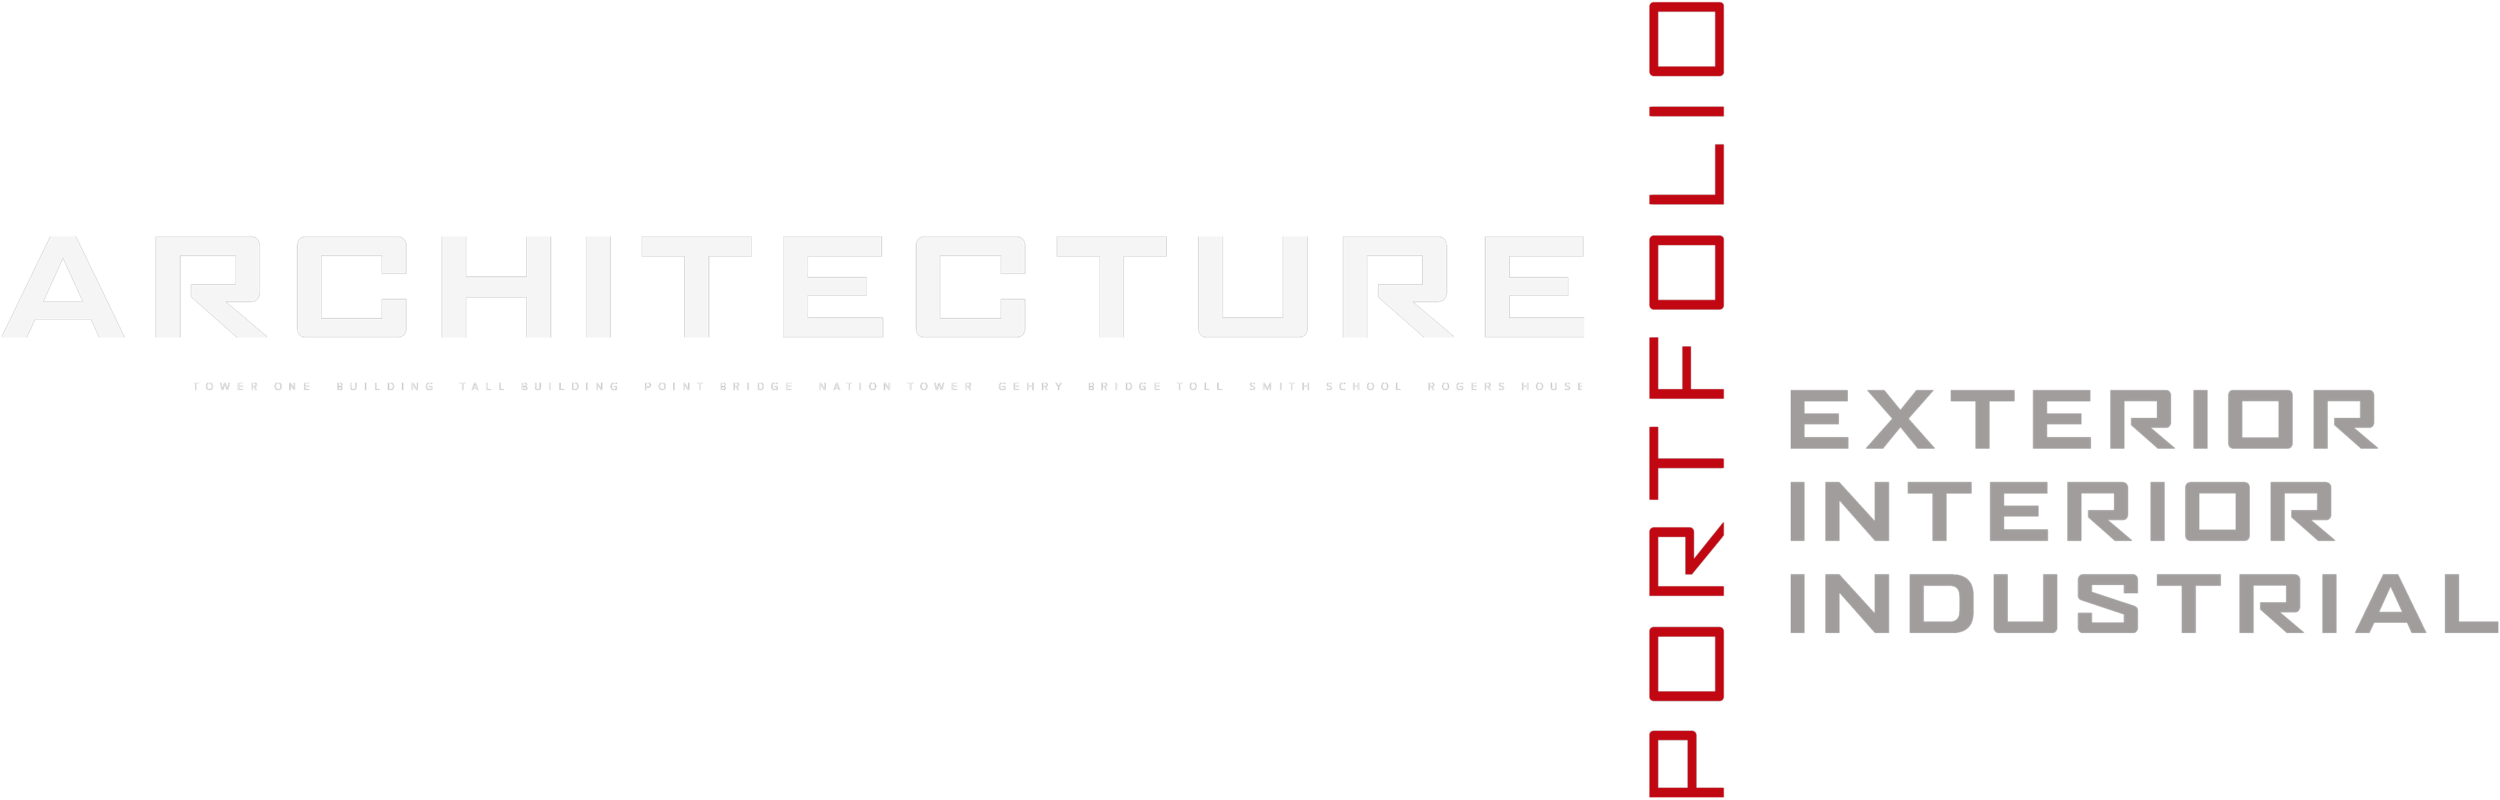 Portfolio-Titles-Arch-3.png